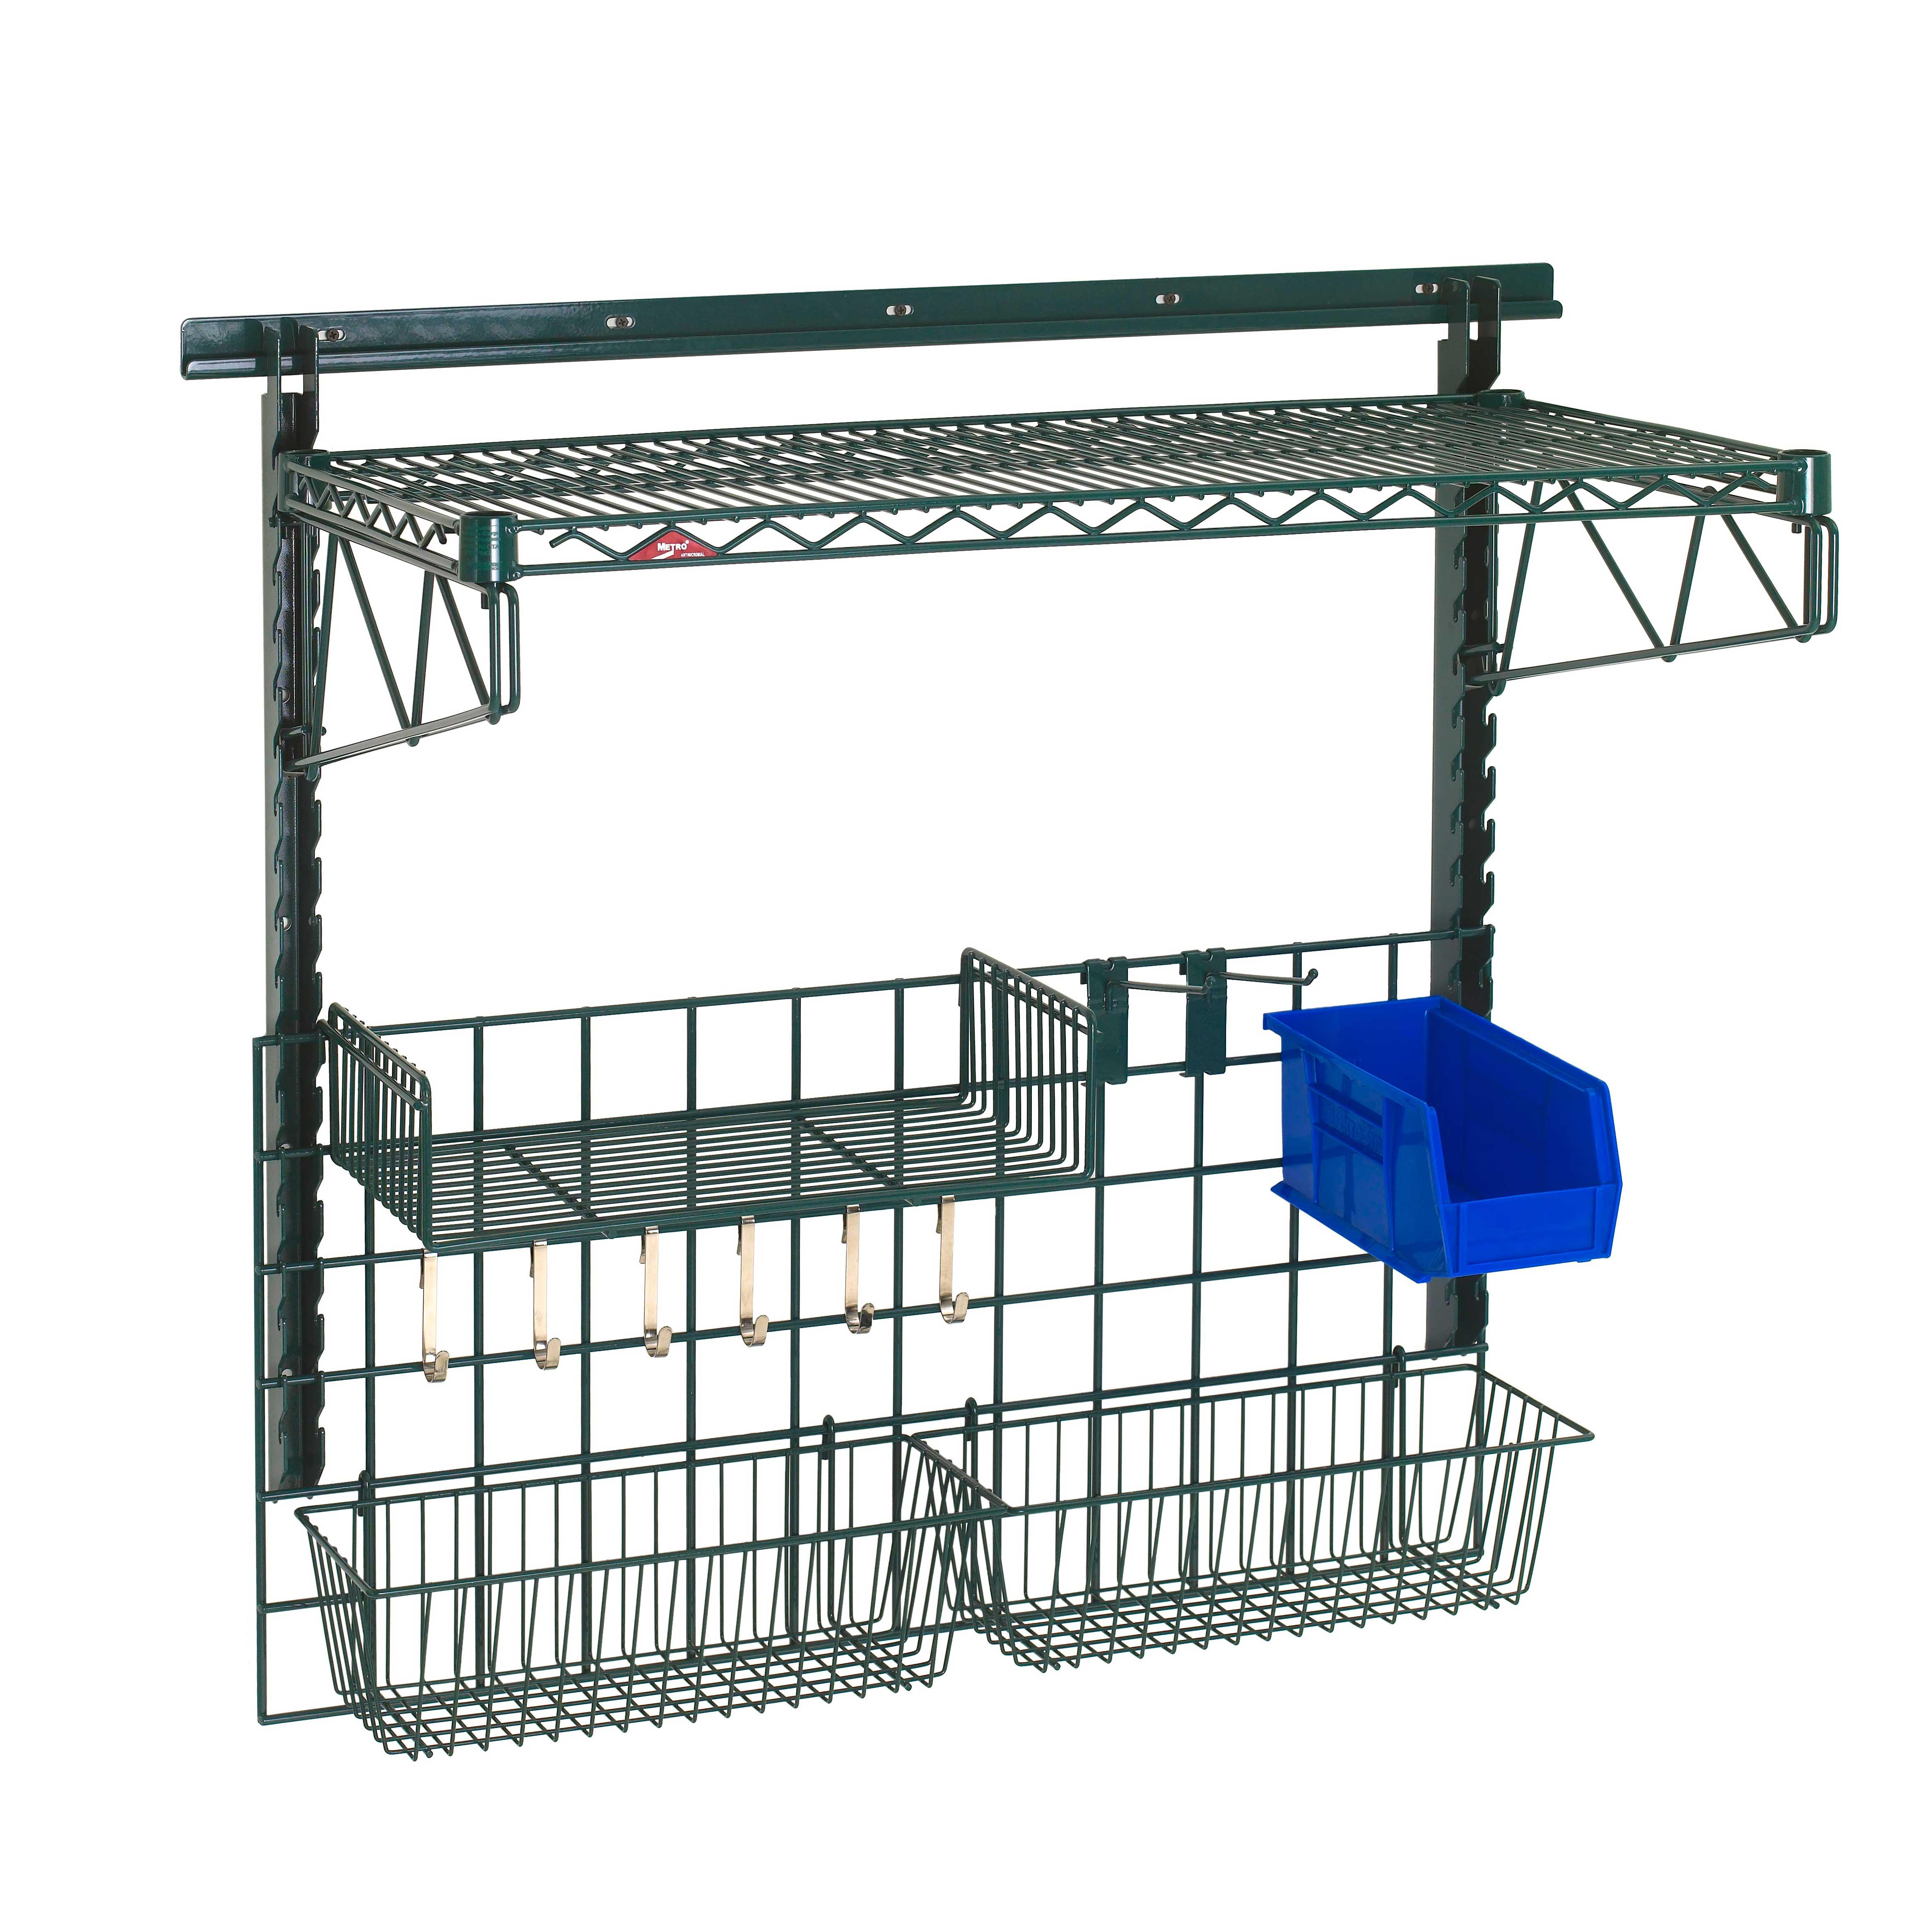 Metro SWK36-1A2-SR shelving, wall grid unit